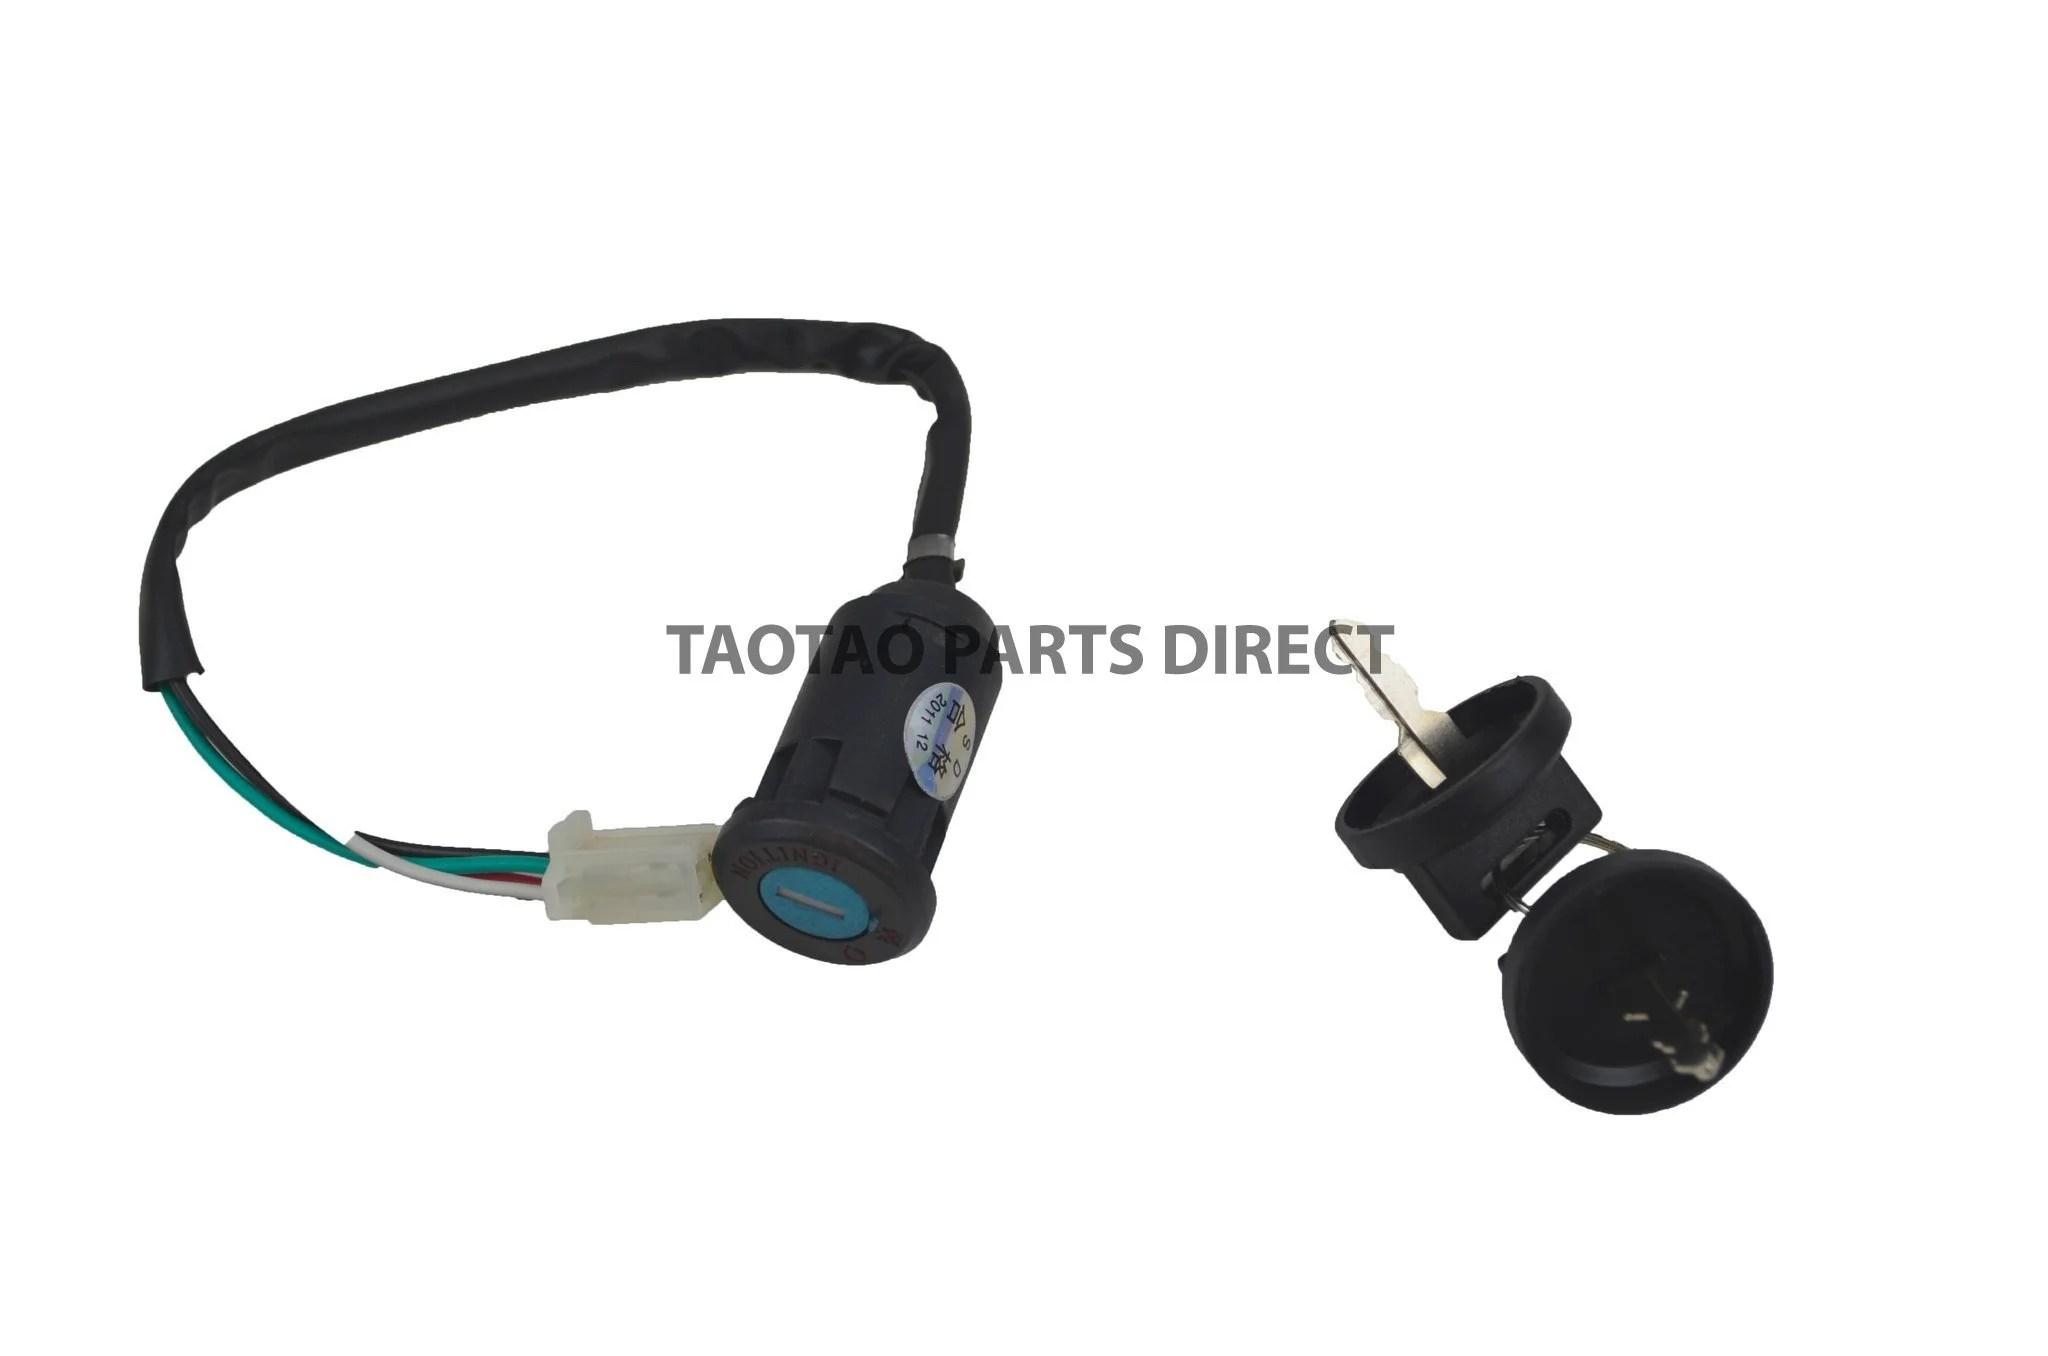 110 125 key ignition taotaopartsdirect com [ 2048 x 1356 Pixel ]